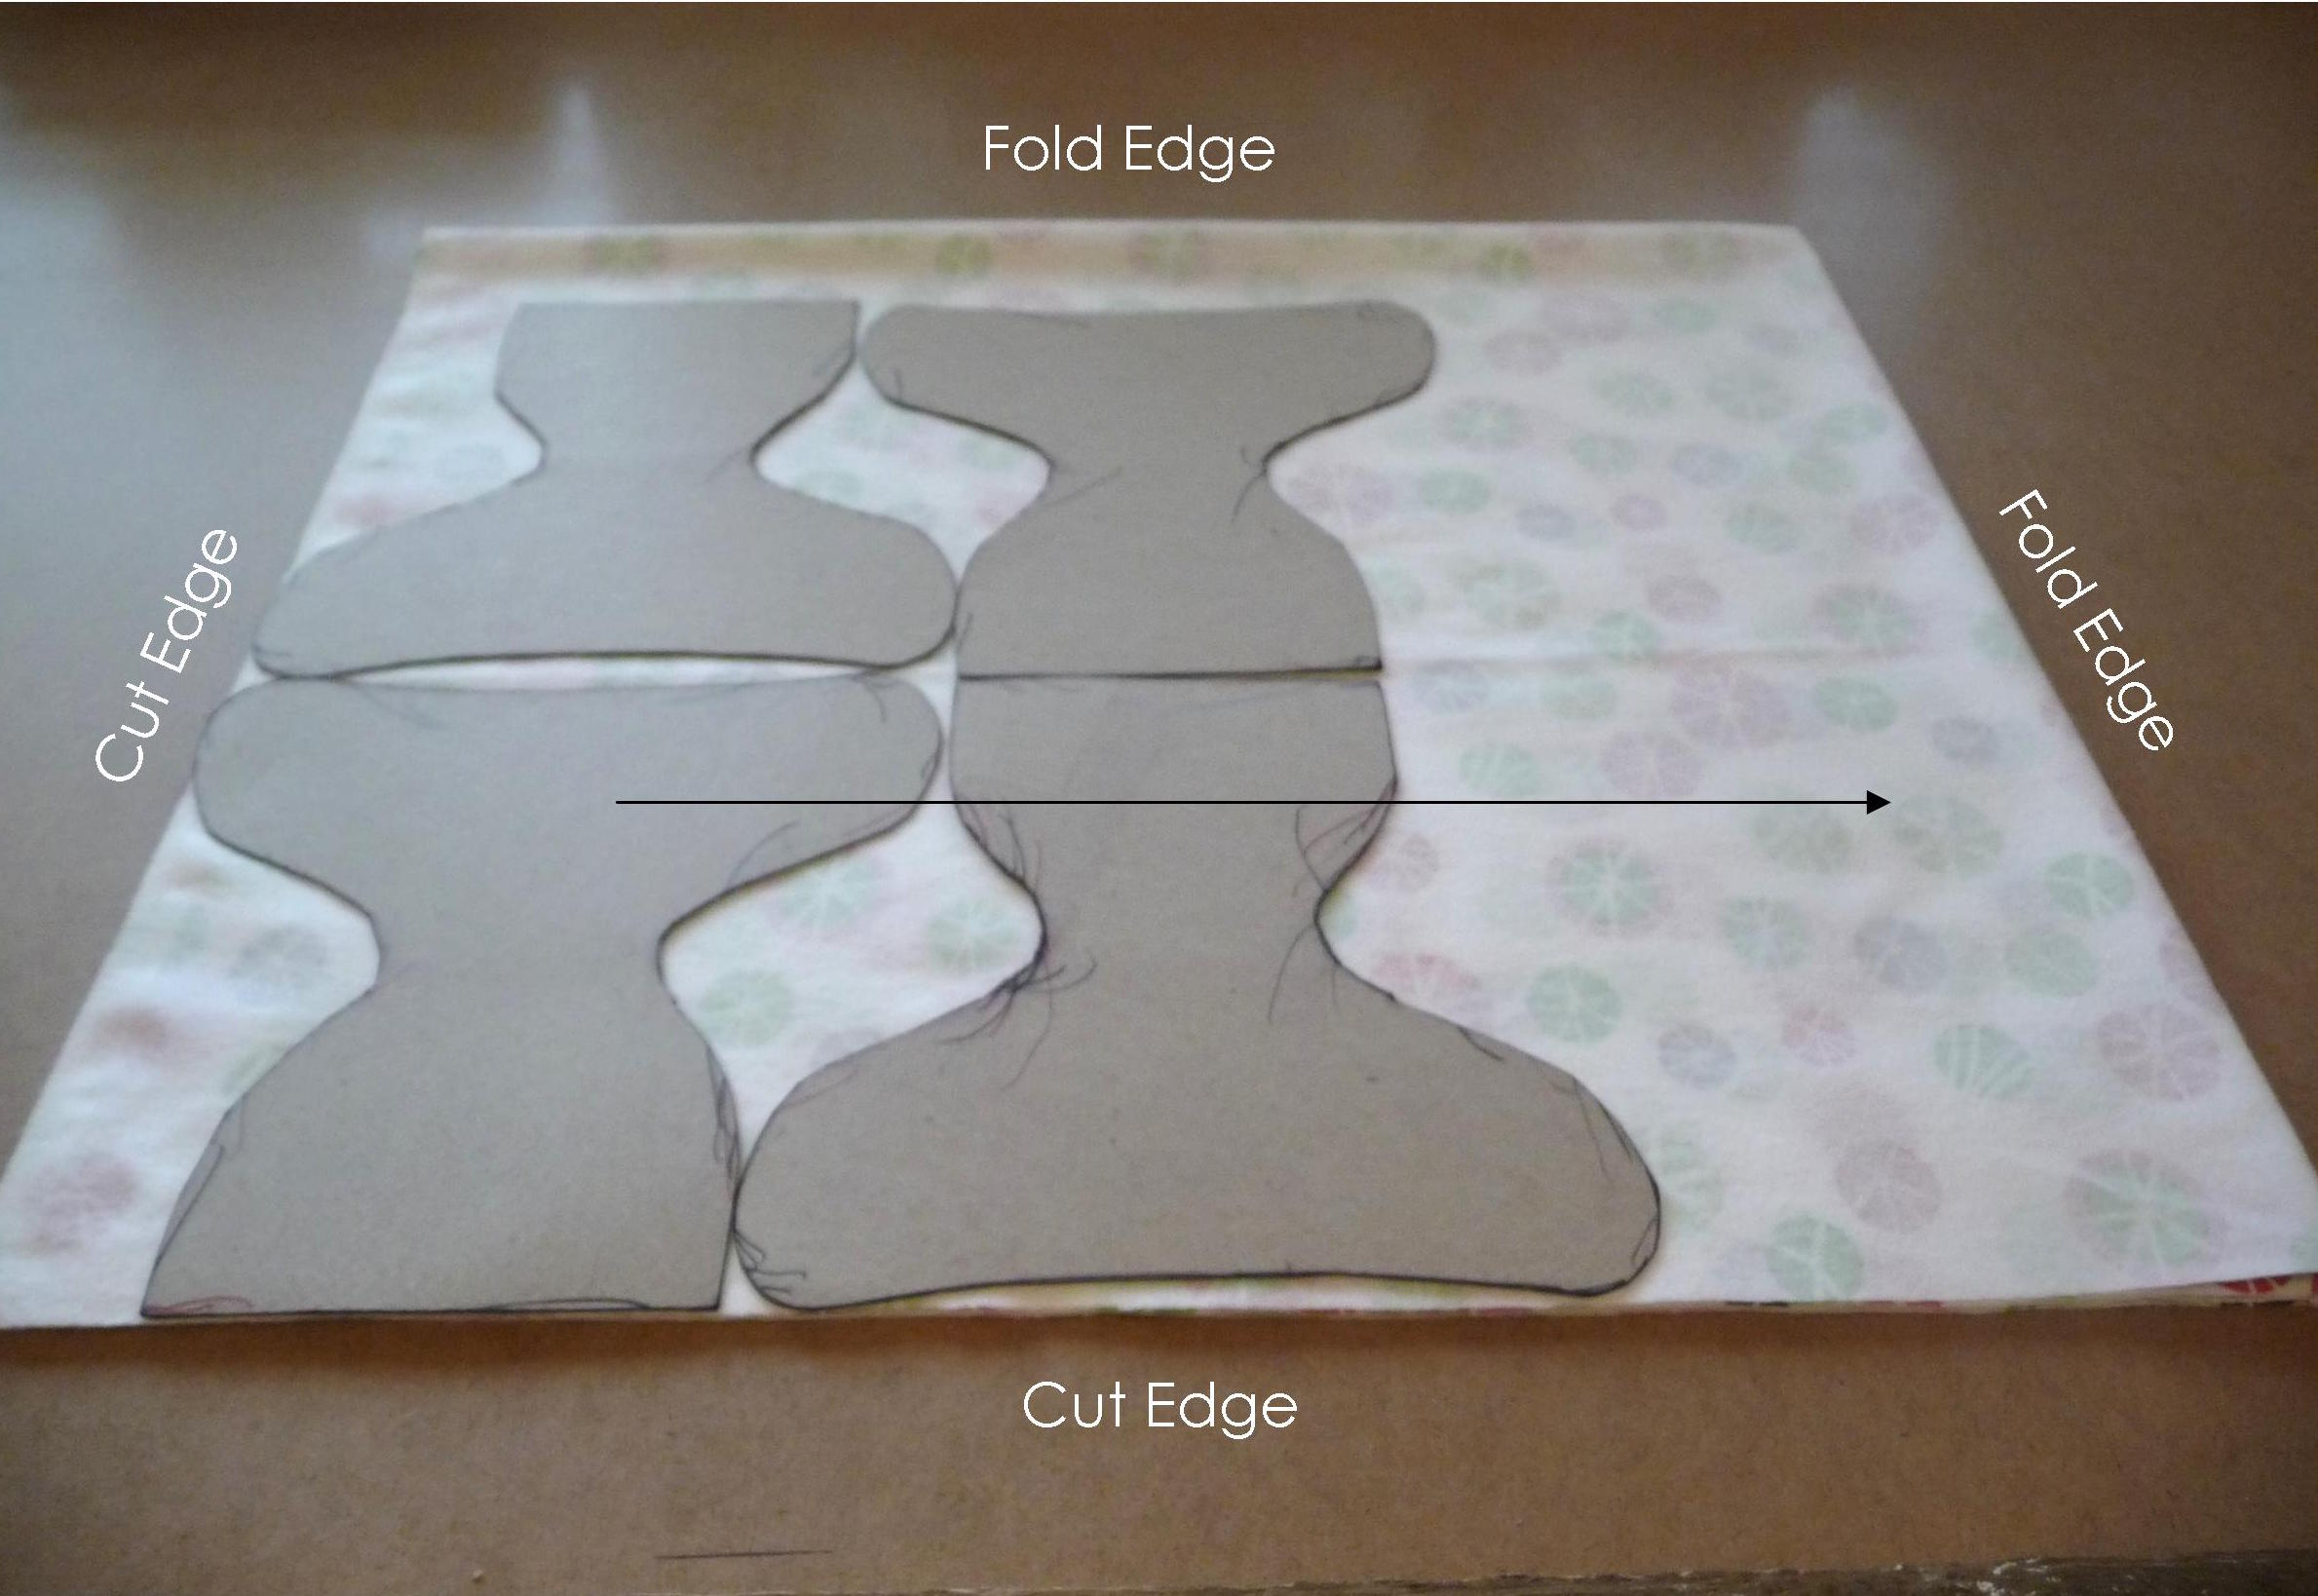 Fold and Cut Edge Diagram.jpg